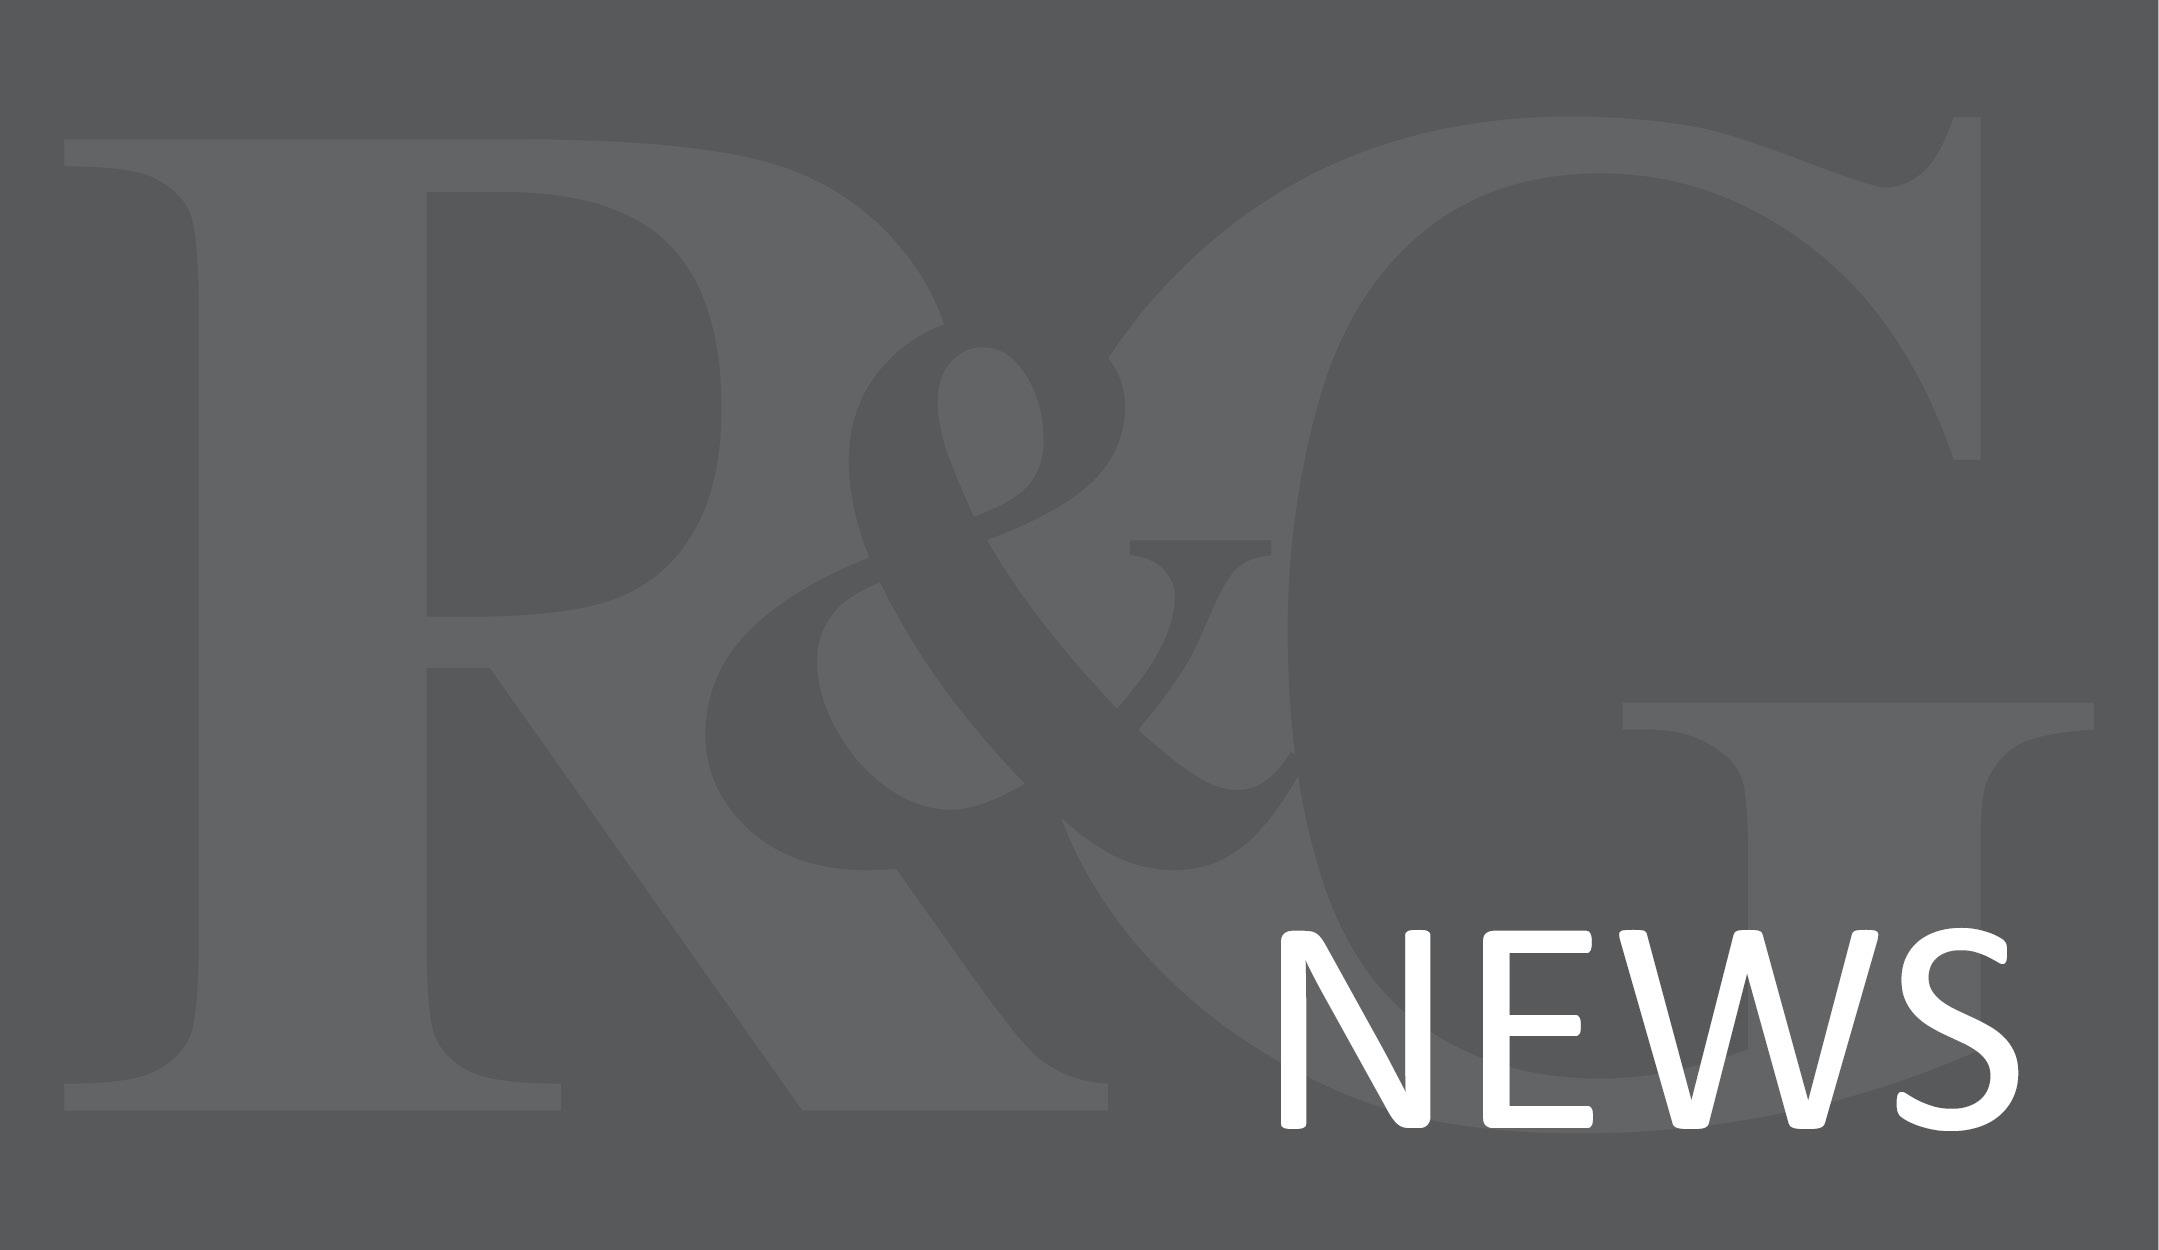 News-Icon